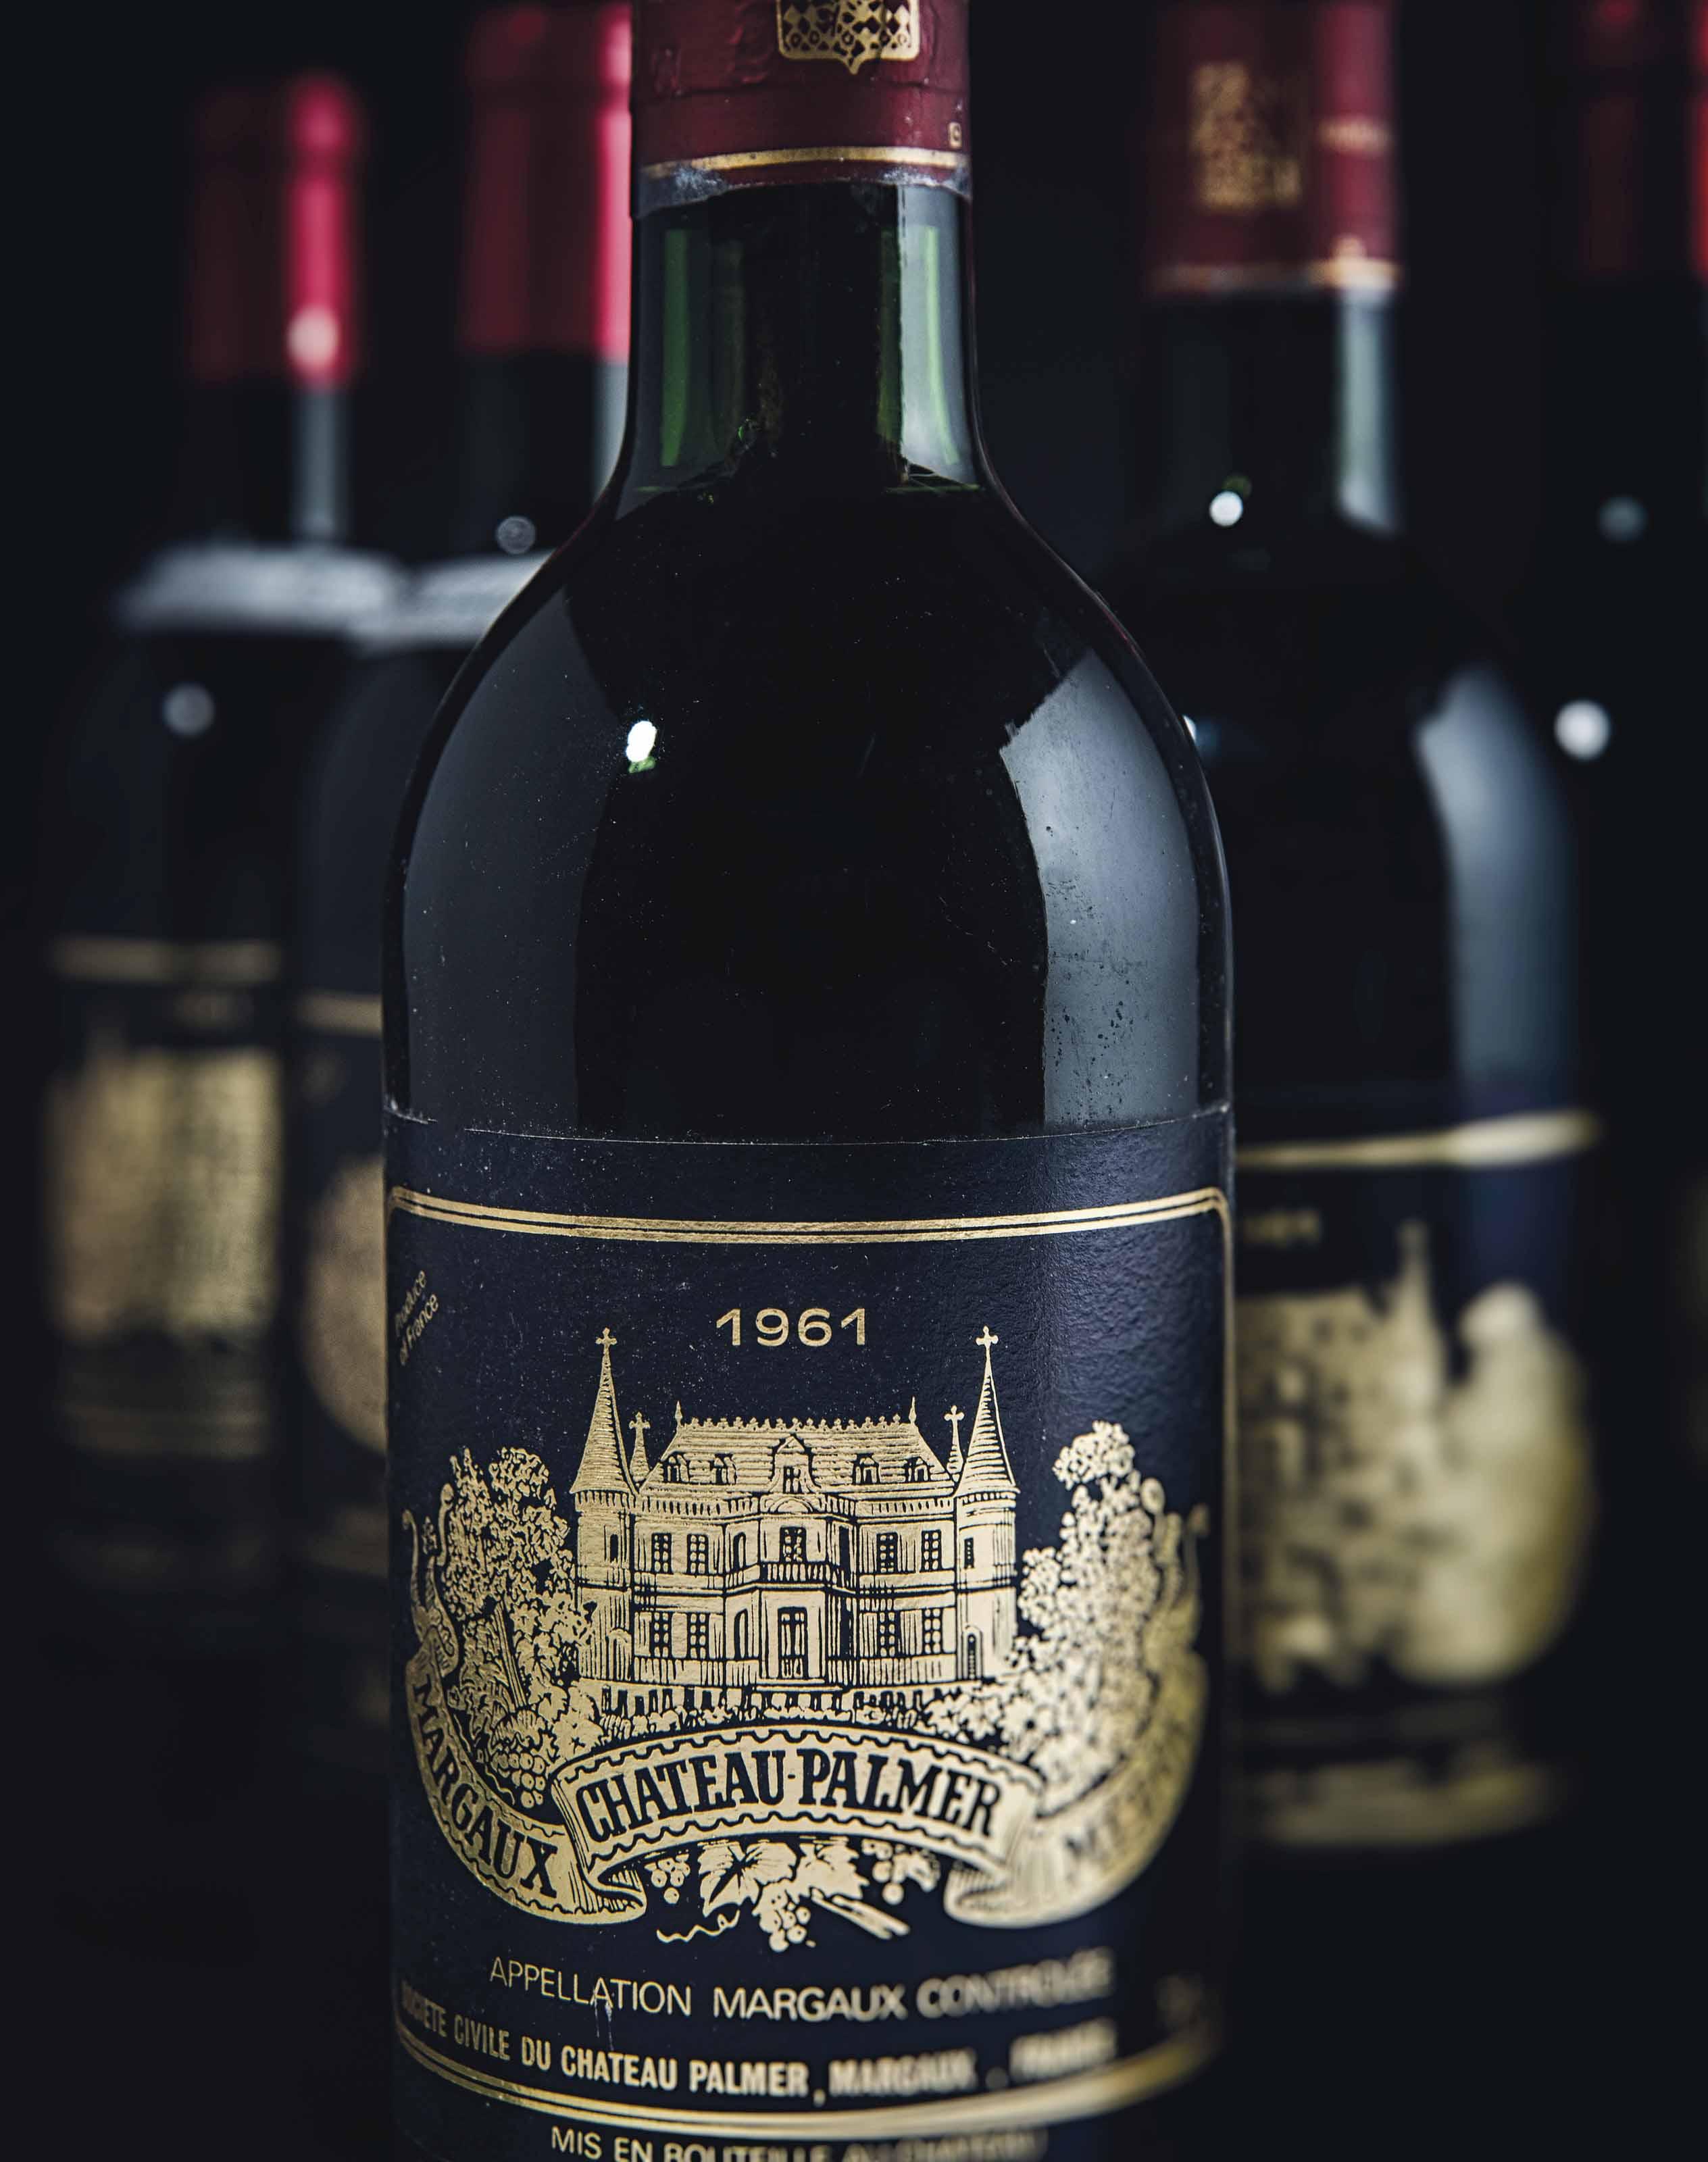 Château Palmer 1961